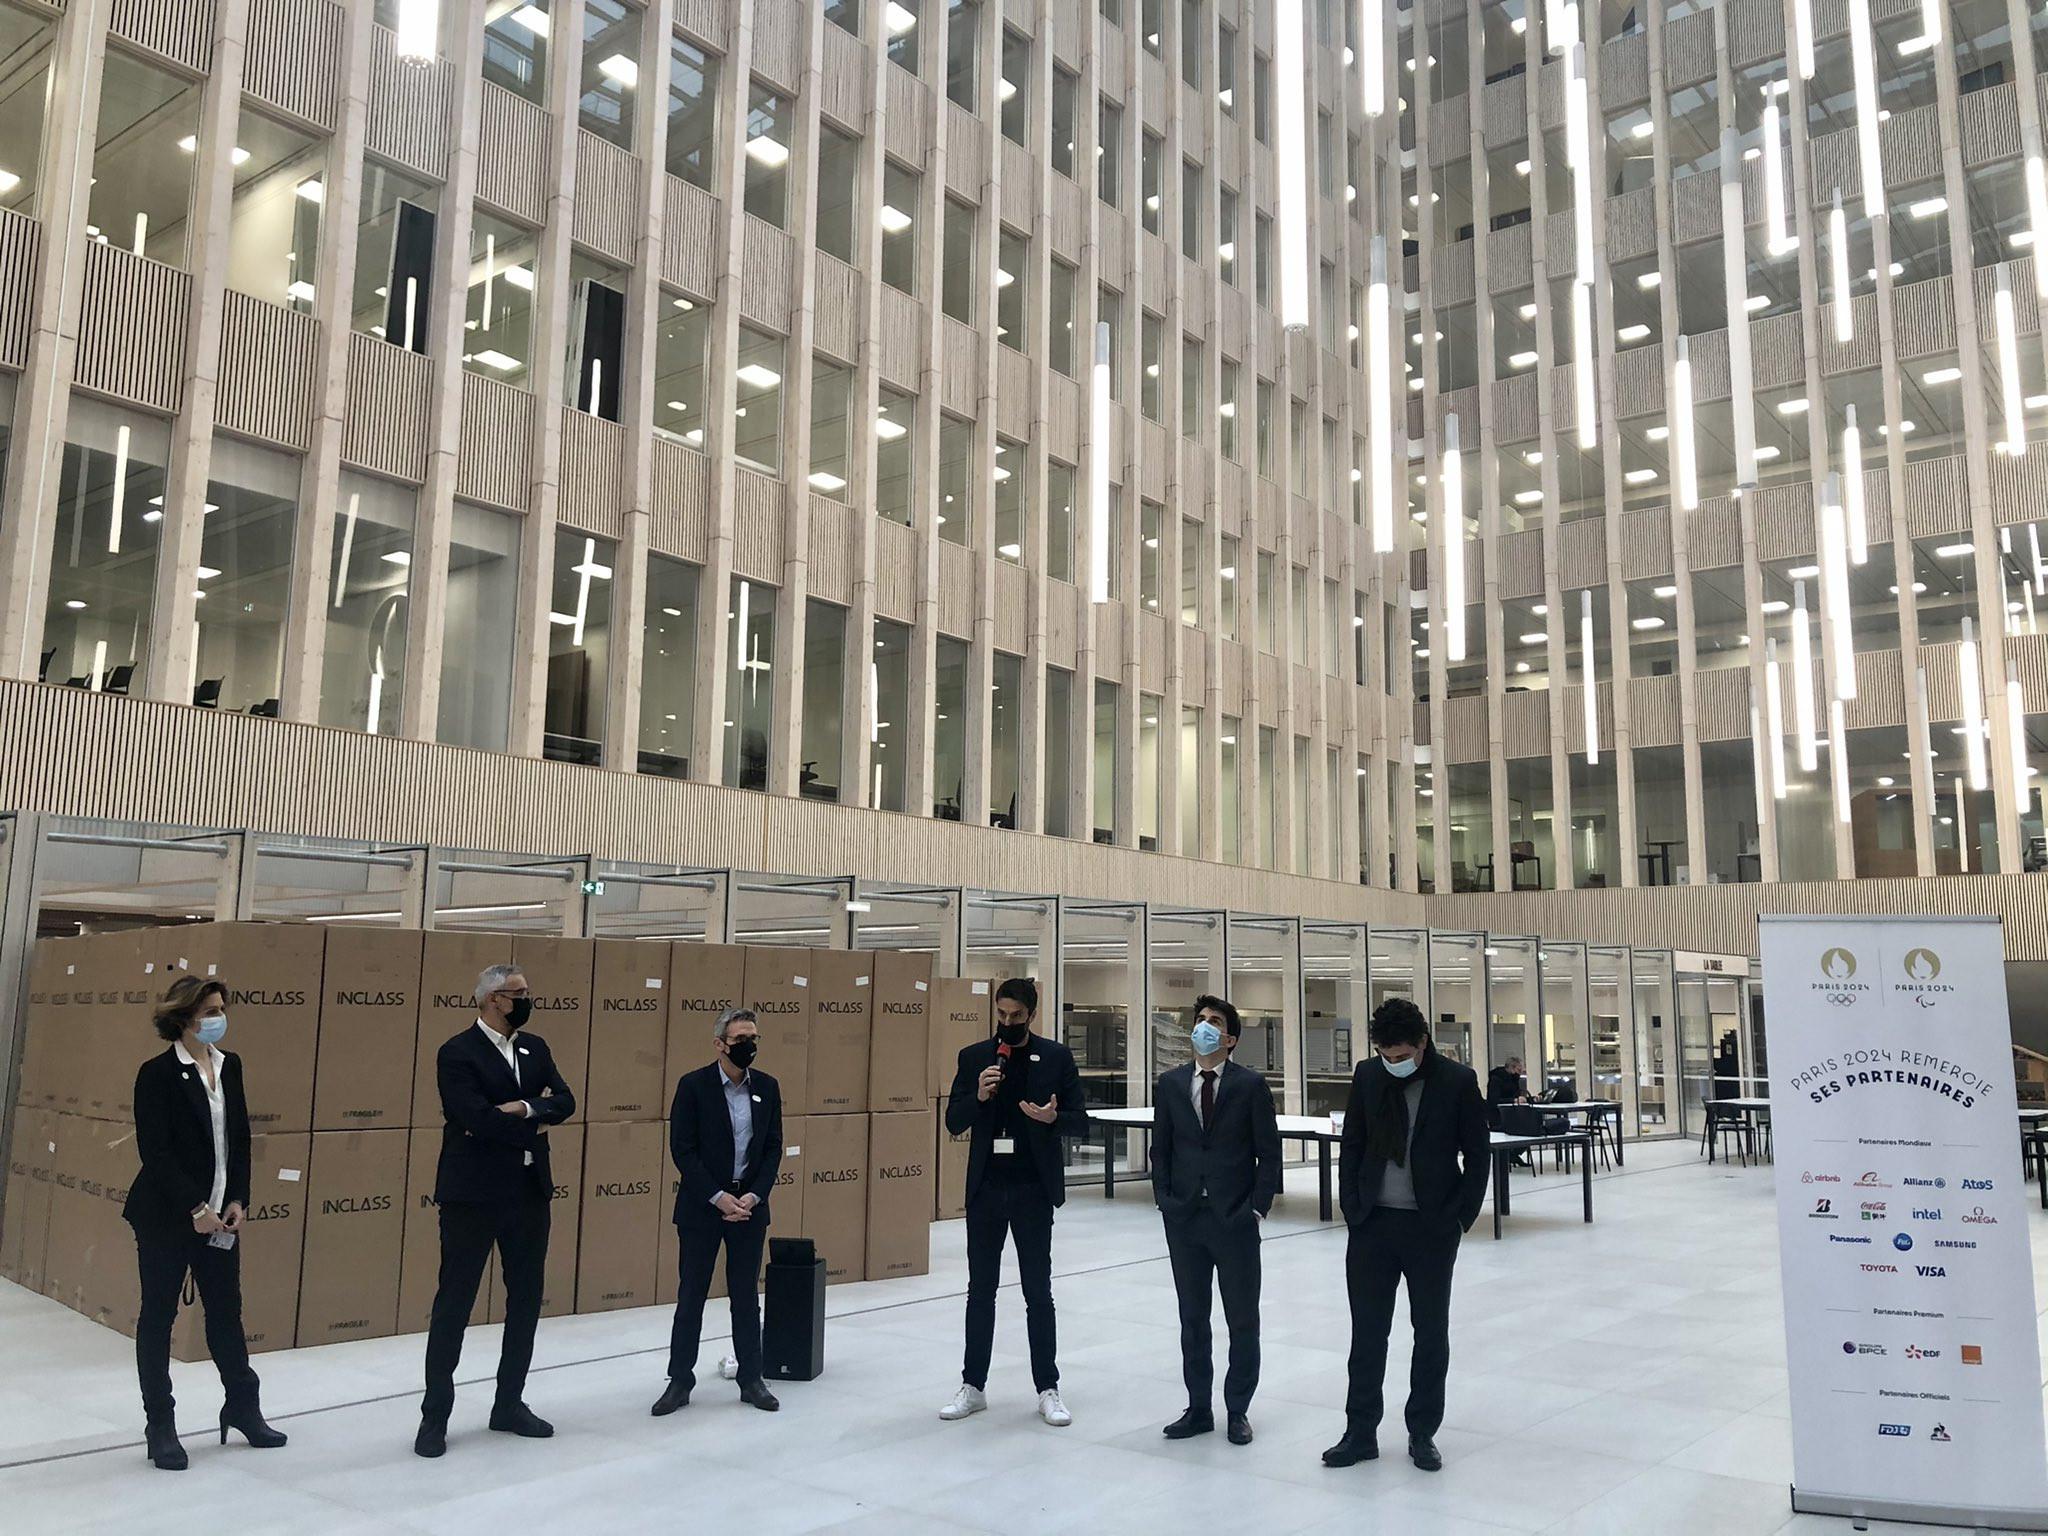 Paris 2024 to move into sustainable headquarters in Saint-Denis